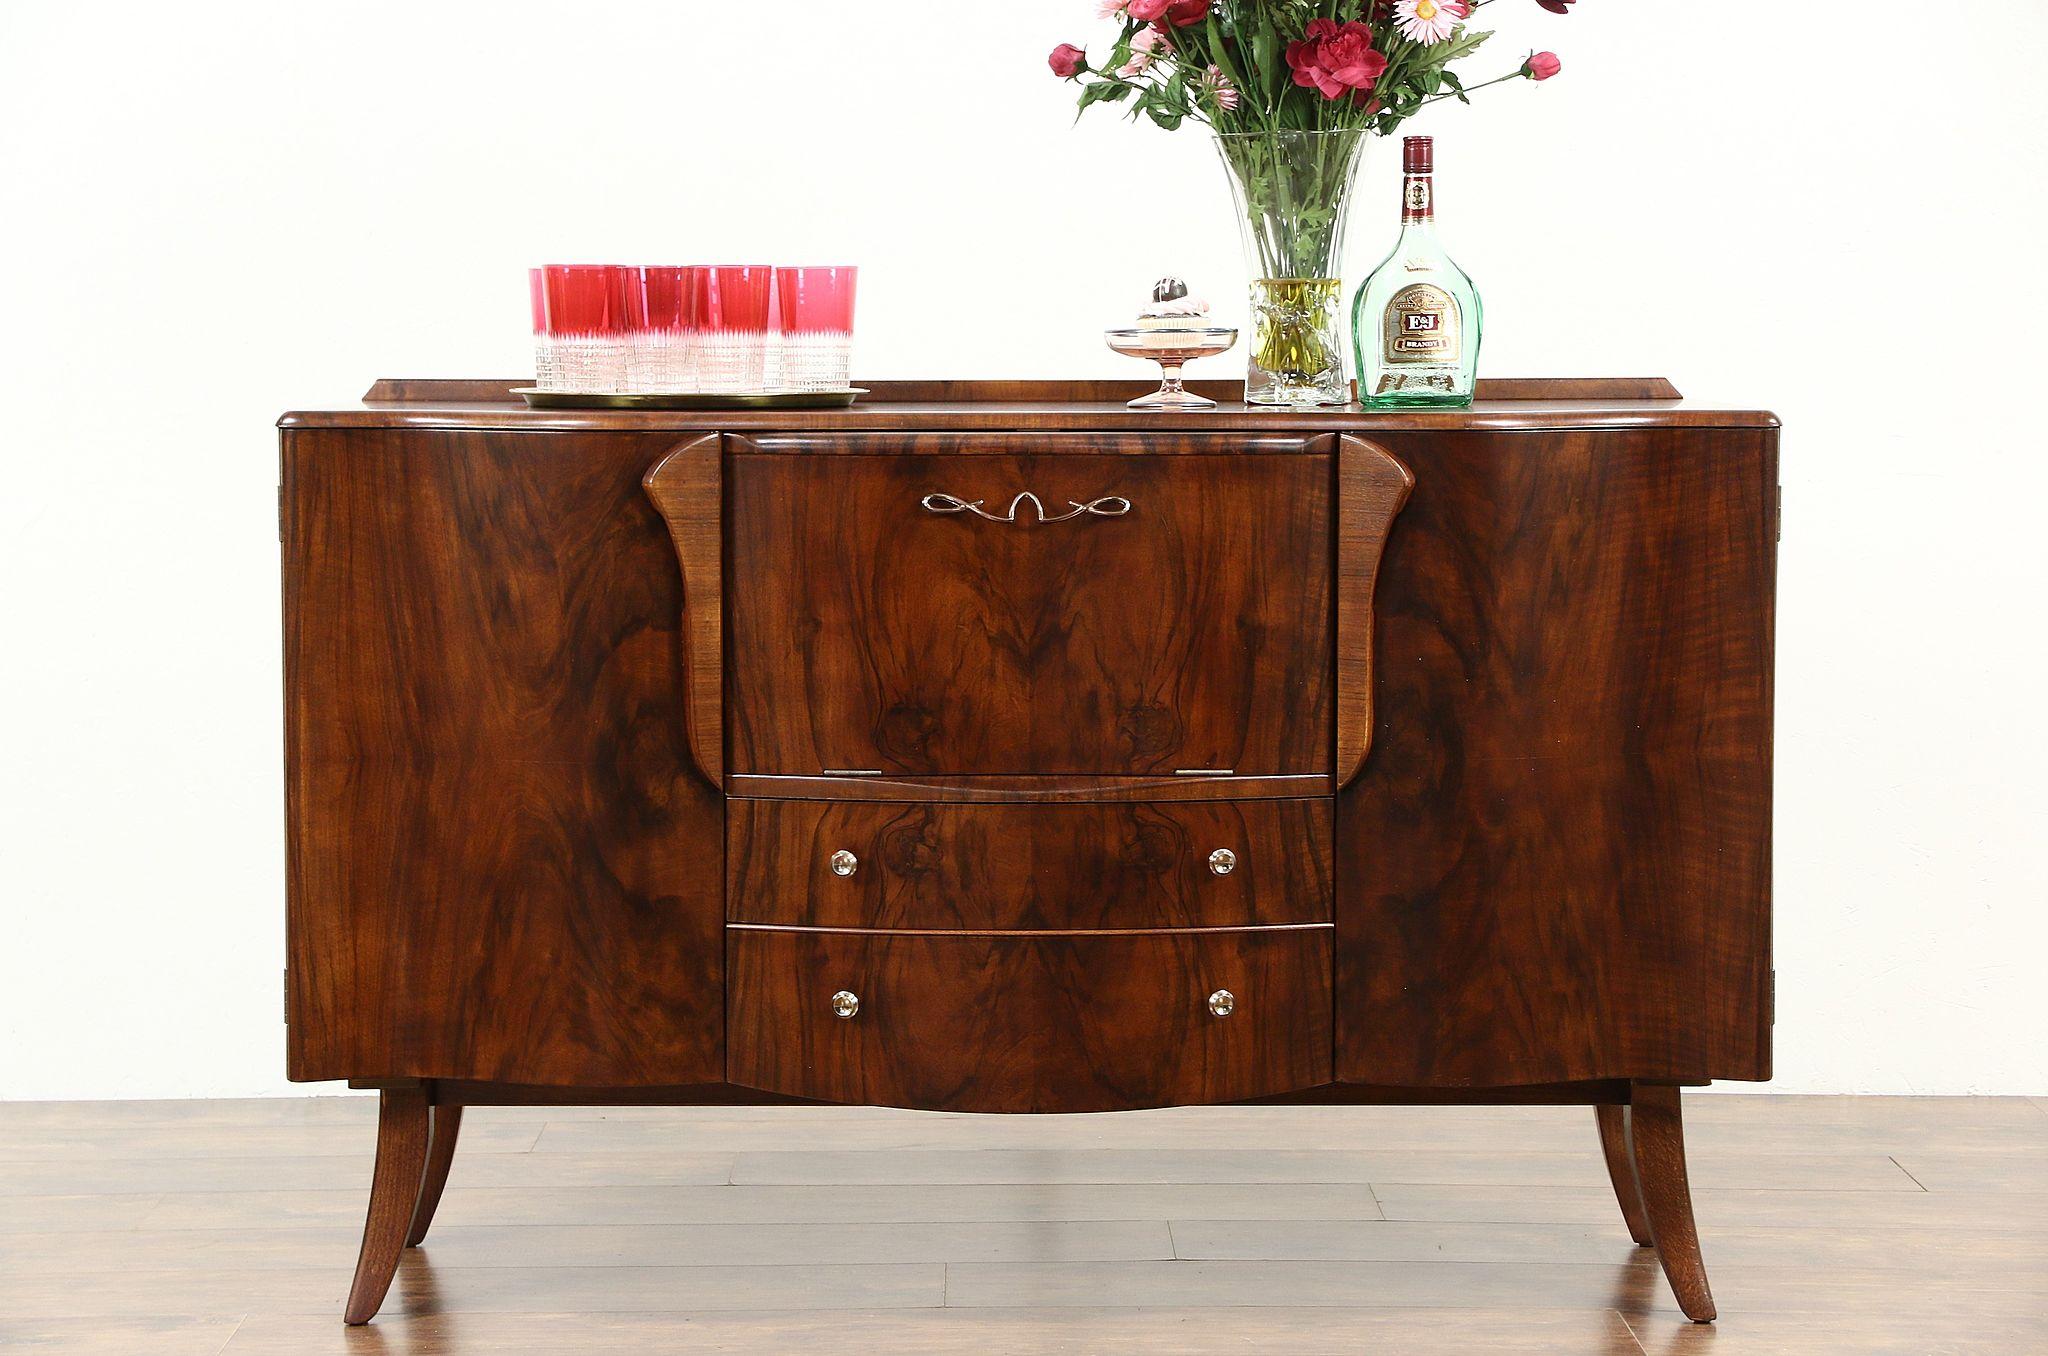 Charmant Midcentury Modern 1960u0027s Vintage English Lighted Bar Cabinet, Signed  Stonehill